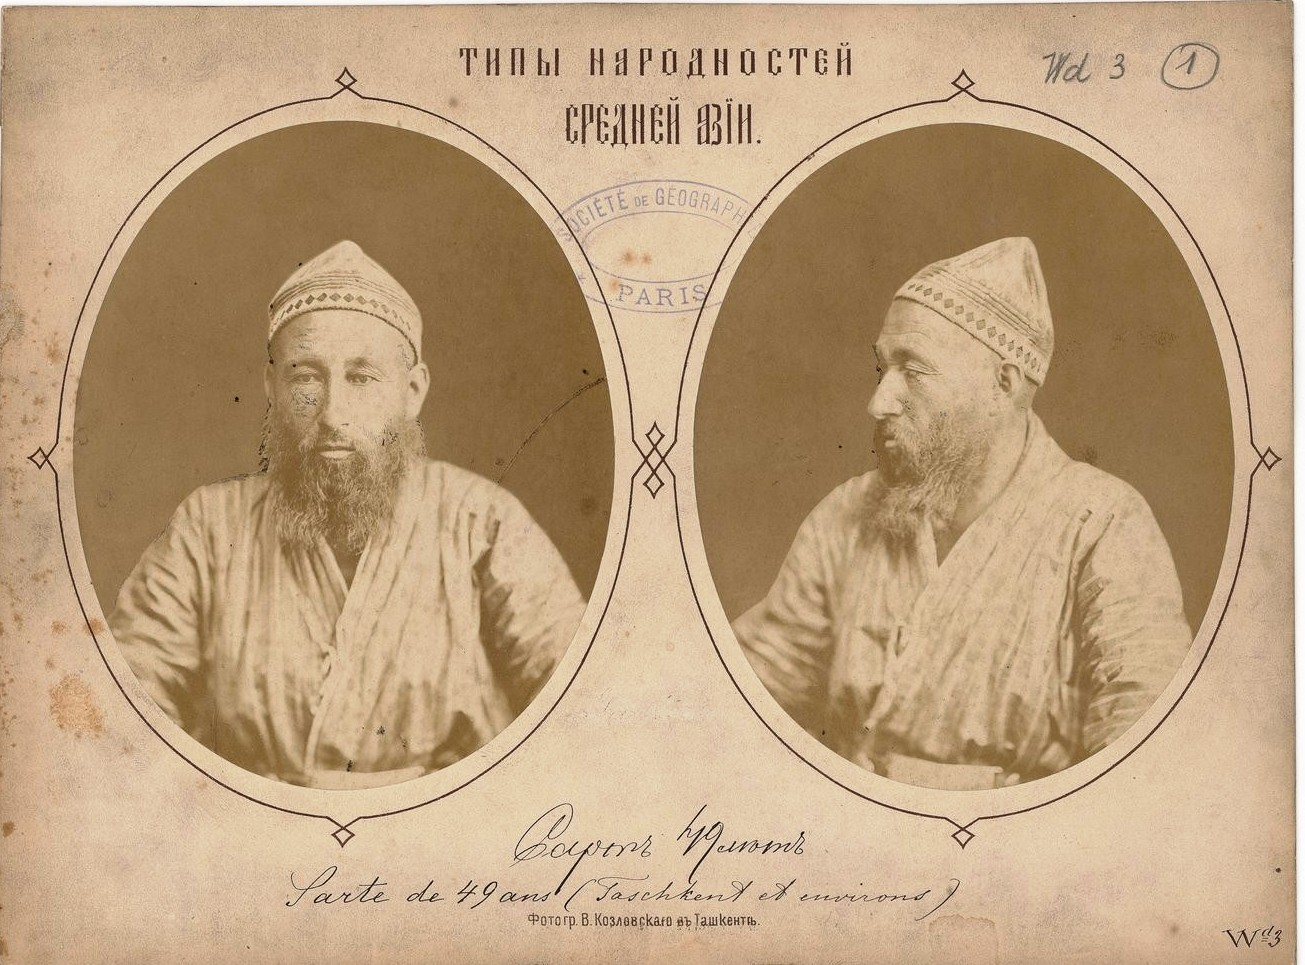 Сарт, 49 лет. Ташкент и окрестности